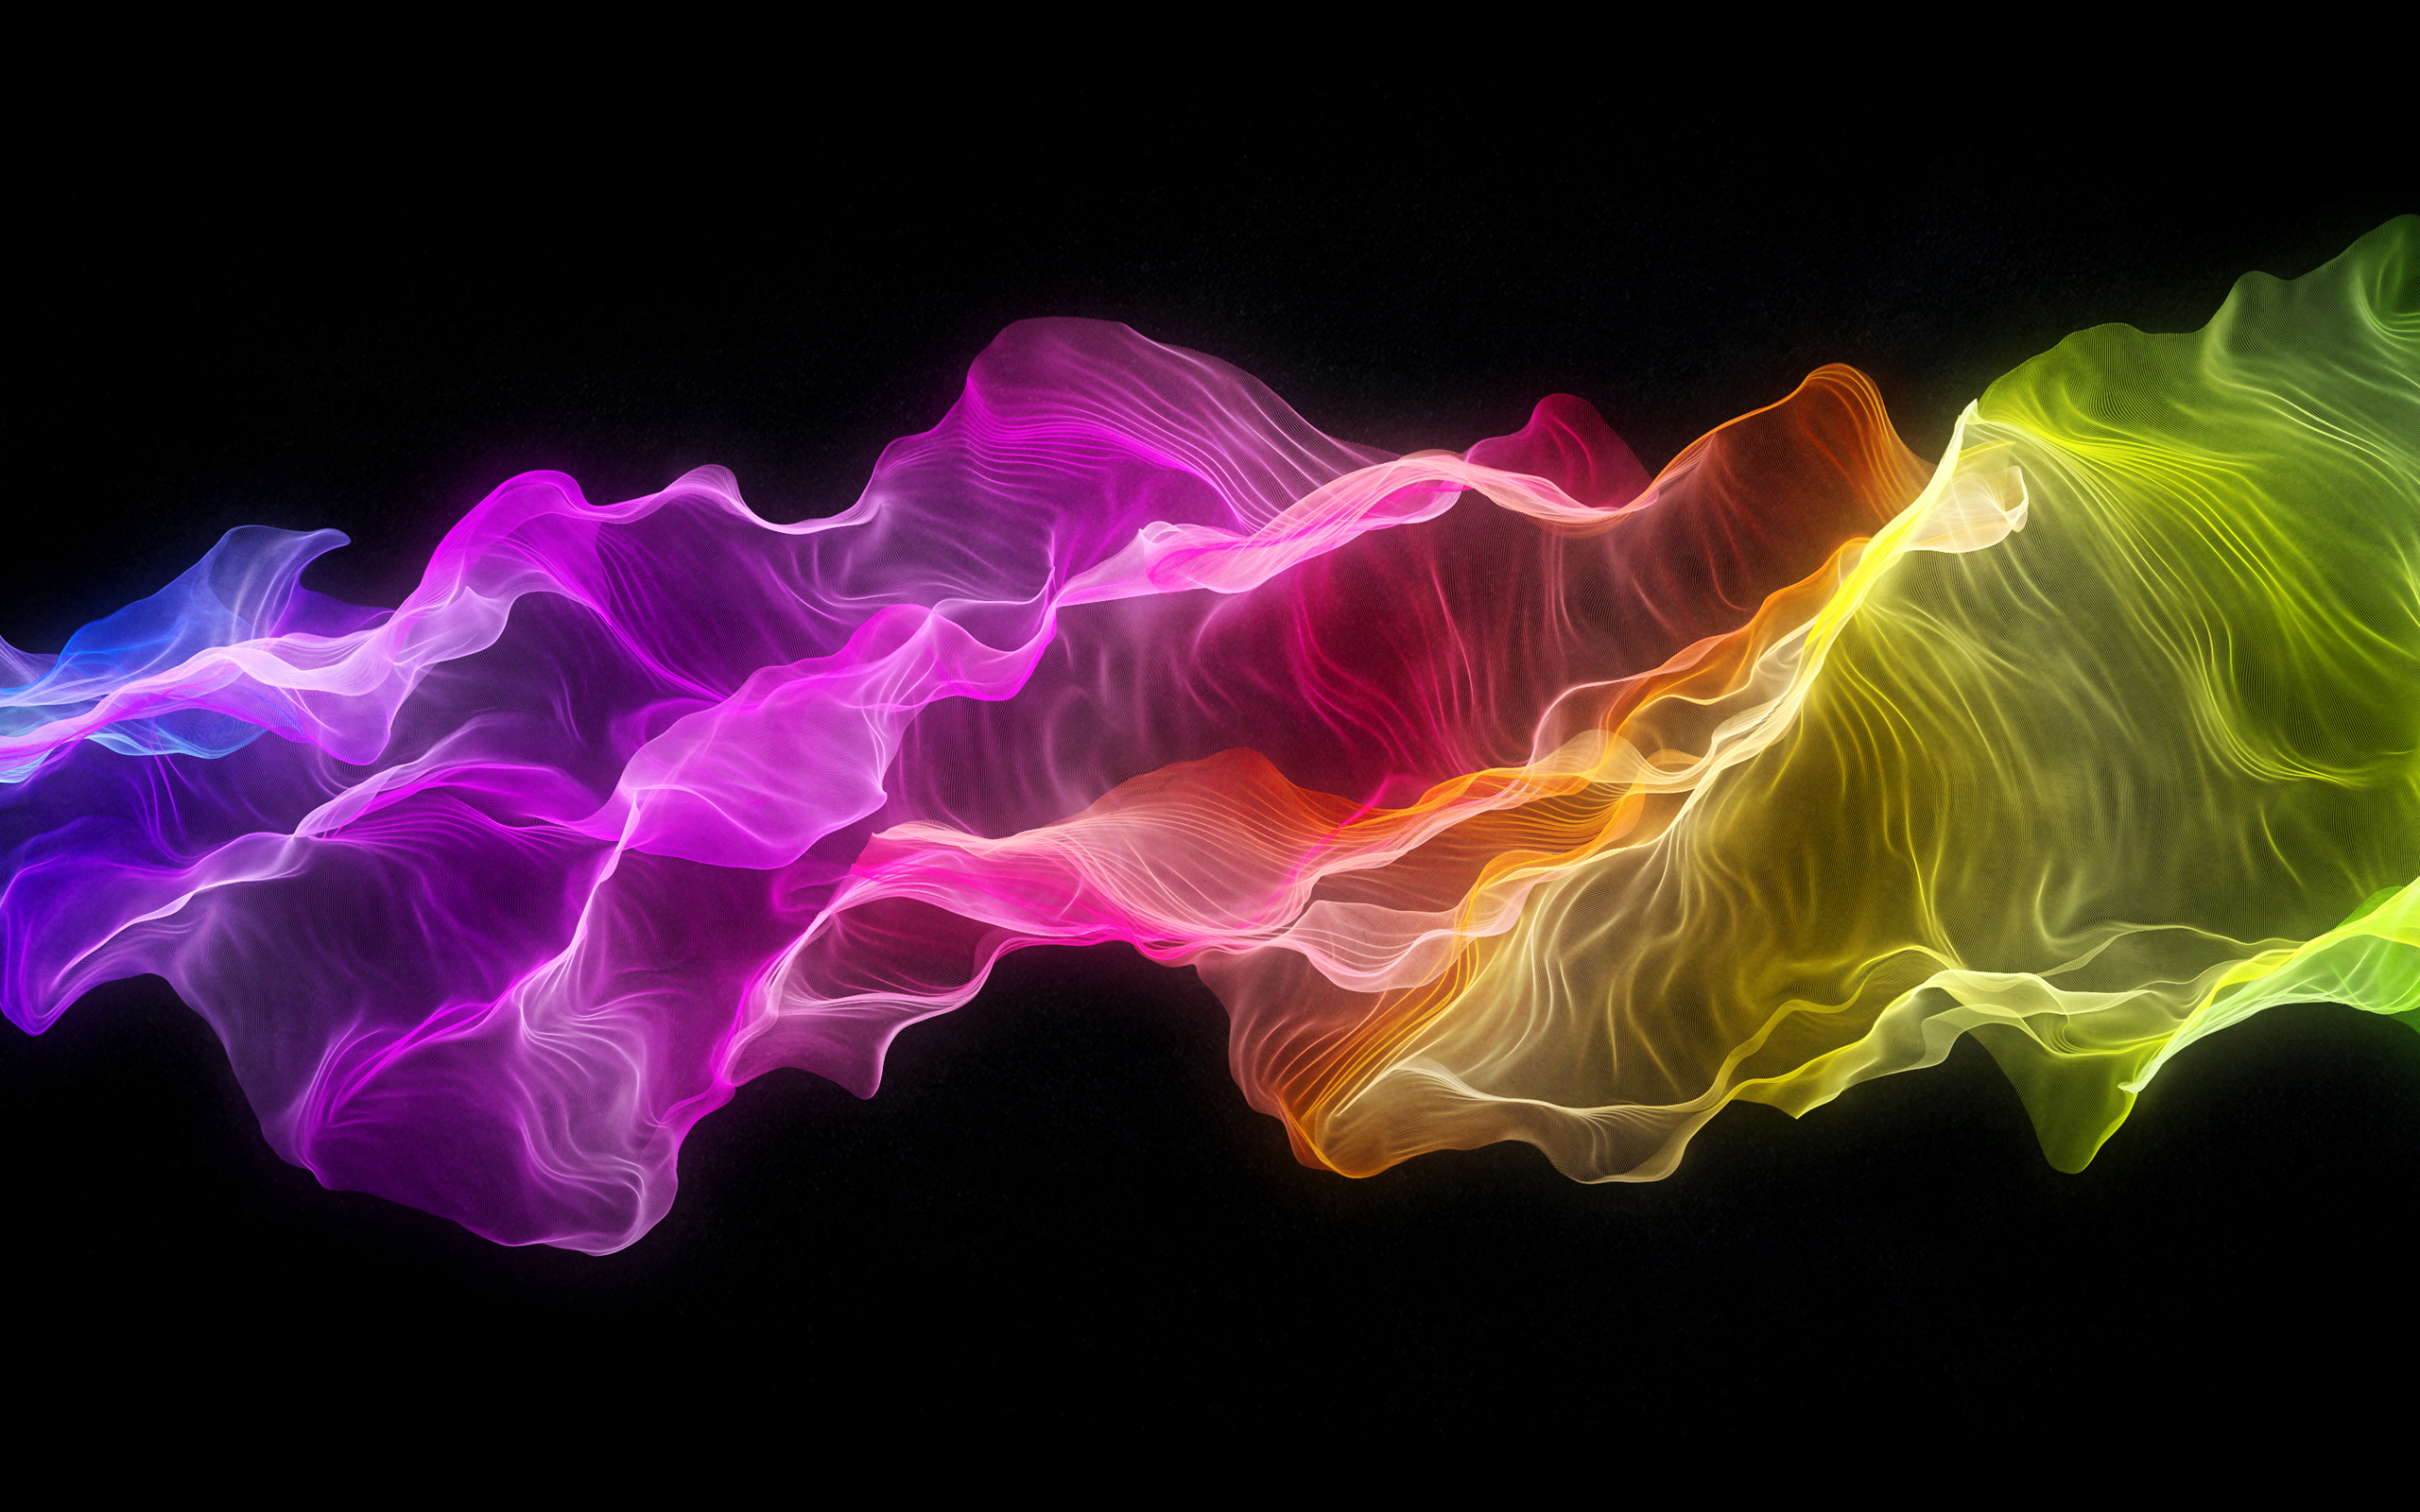 Rainbow art waves